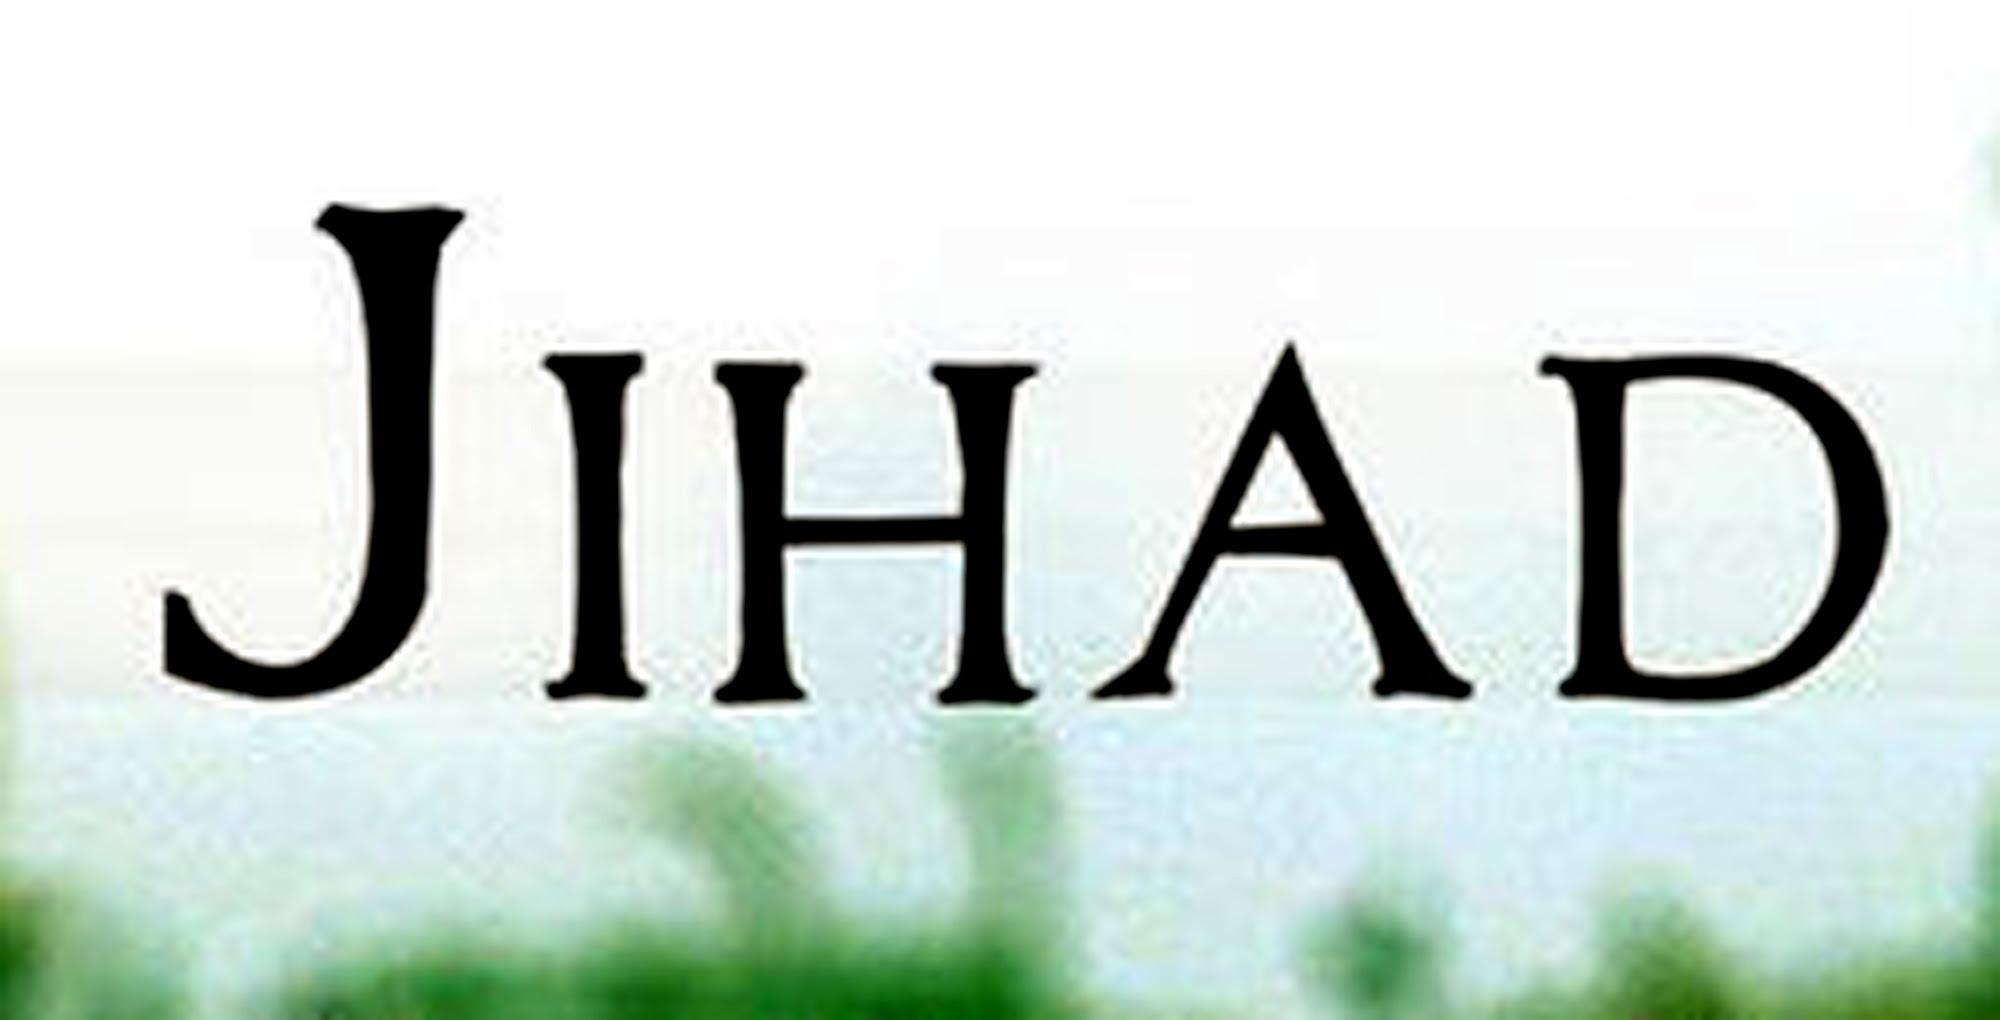 http://israelnewsagency.com/wp-content/uploads/2015/01/jihad.jpg